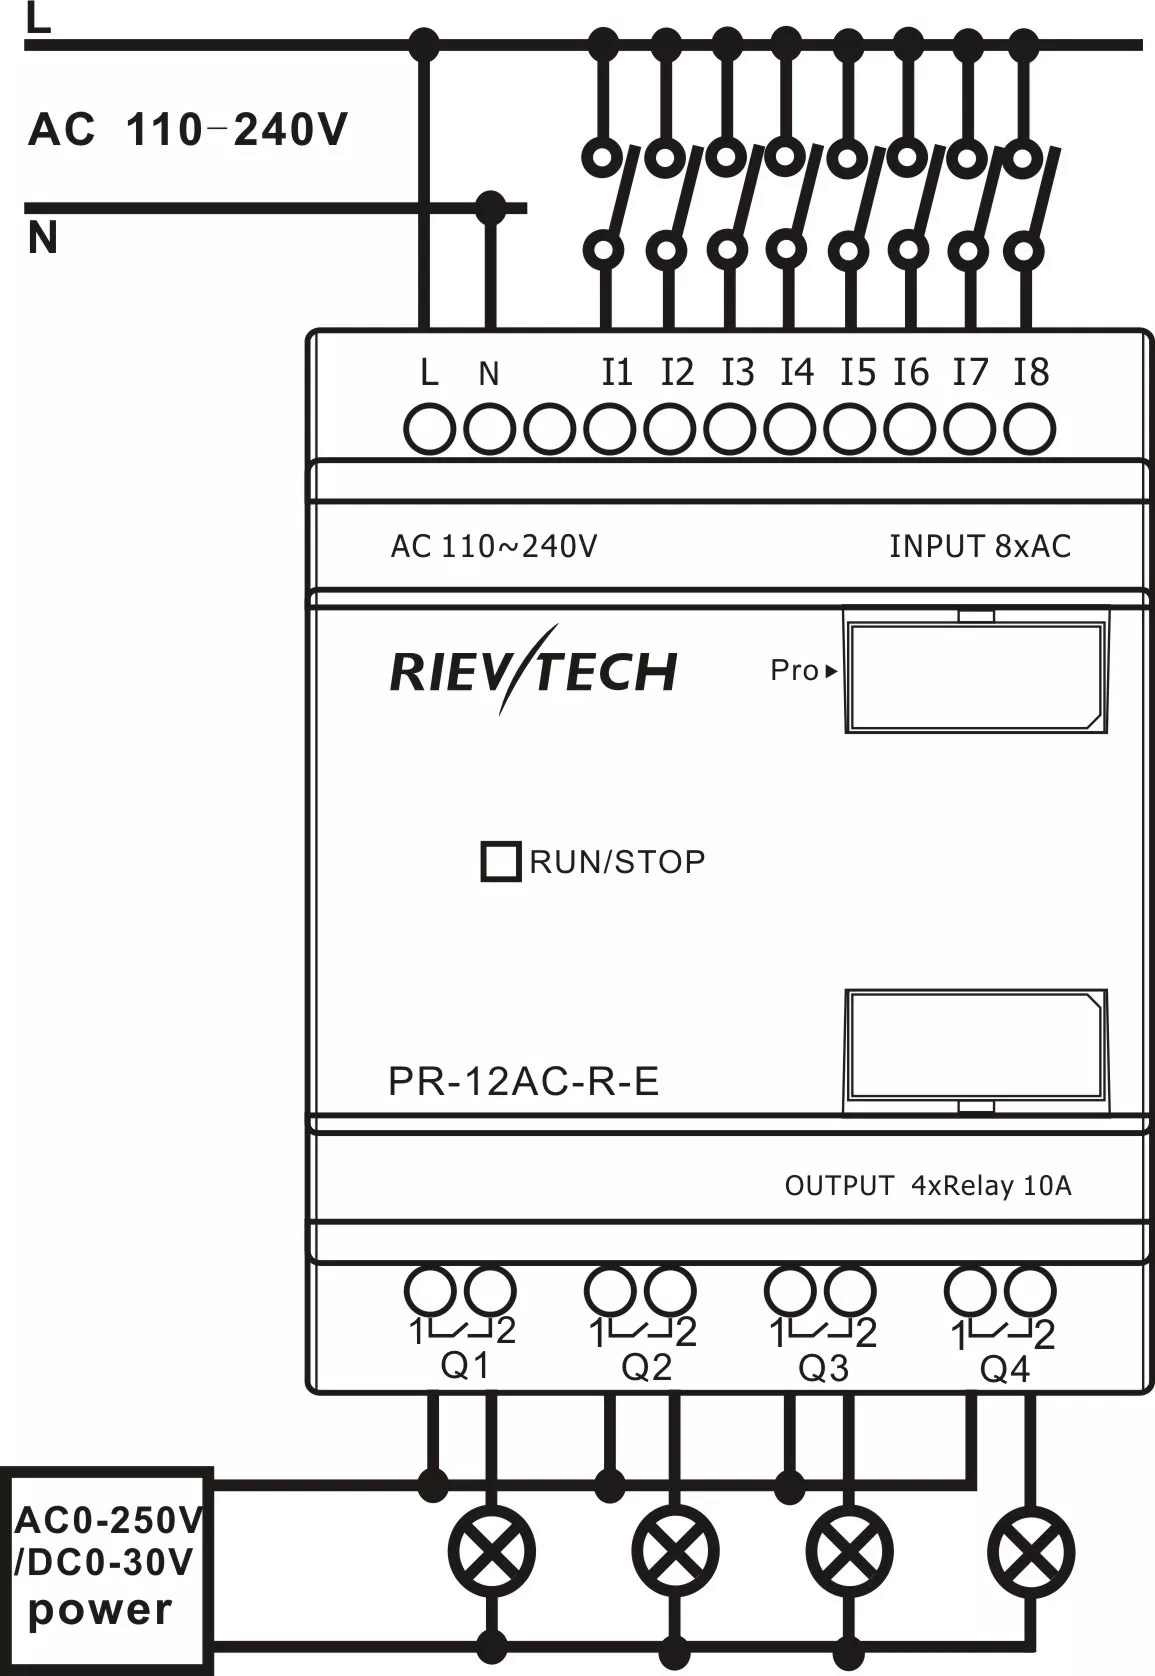 hight resolution of wiring diagram logo wiring diagram origin business wiring diagram ogo wiring diagram wiring diagram schematics event